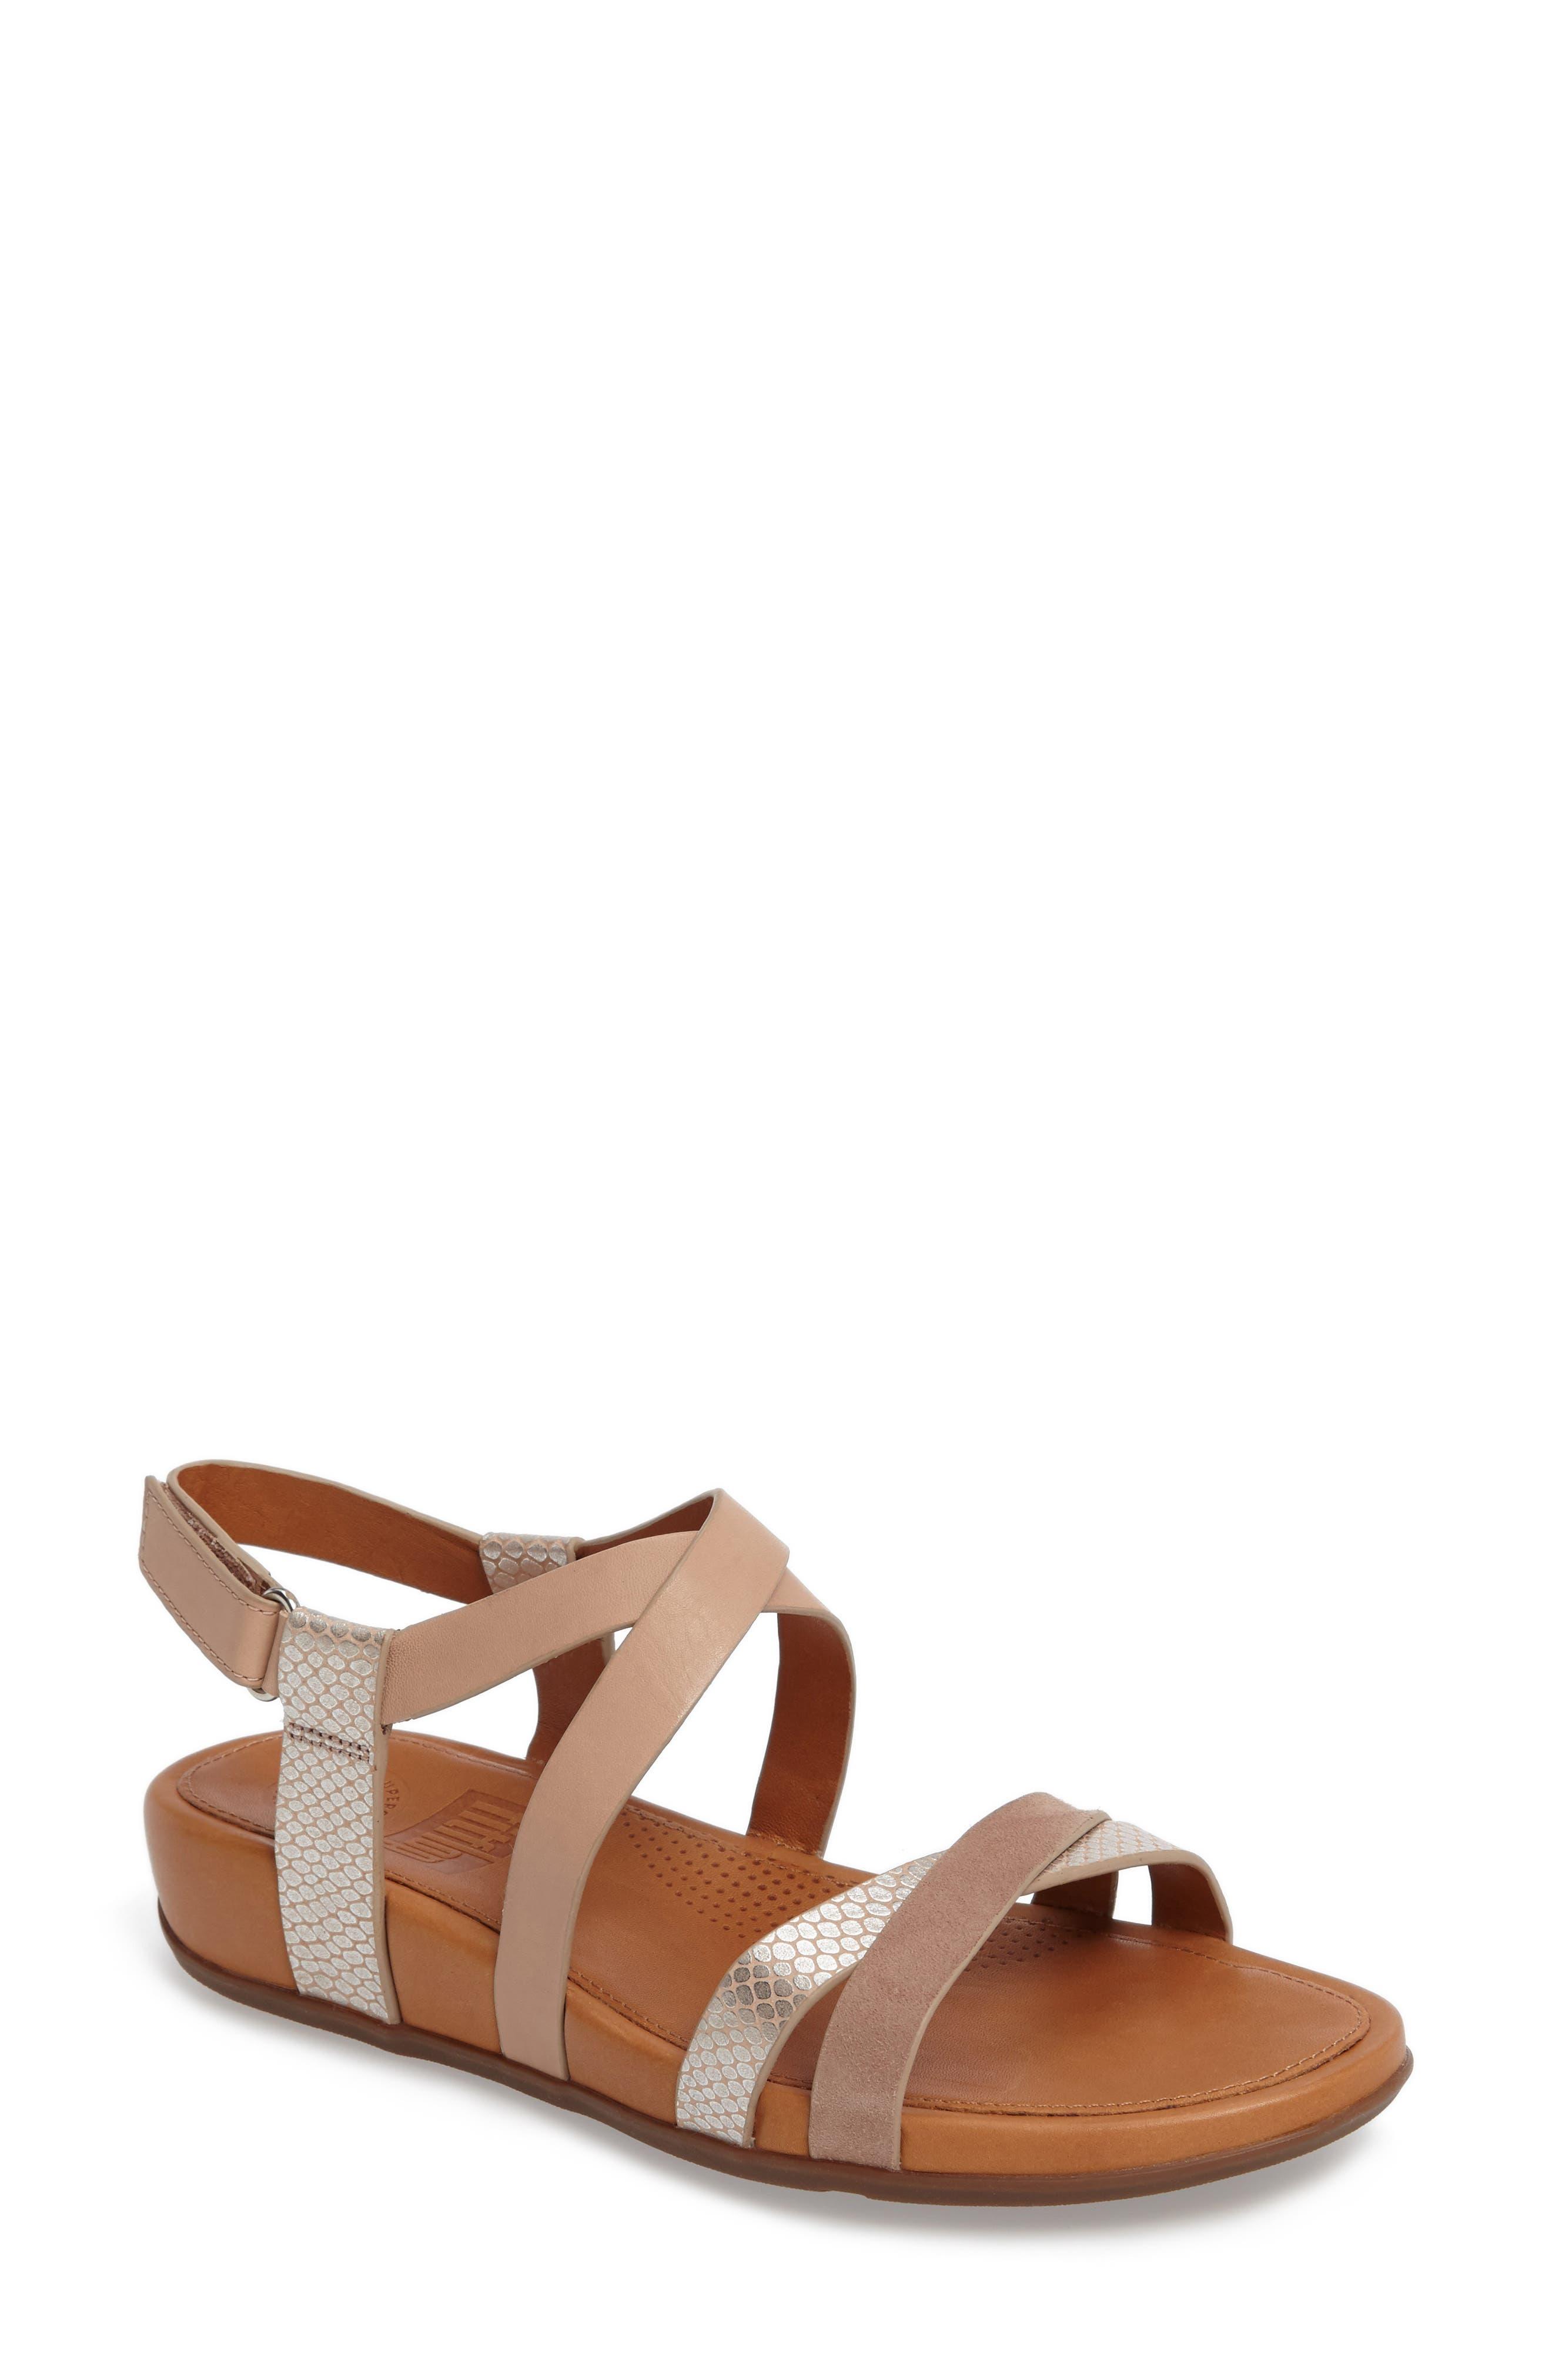 Lumy Crisscross Sandal,                         Main,                         color, 290